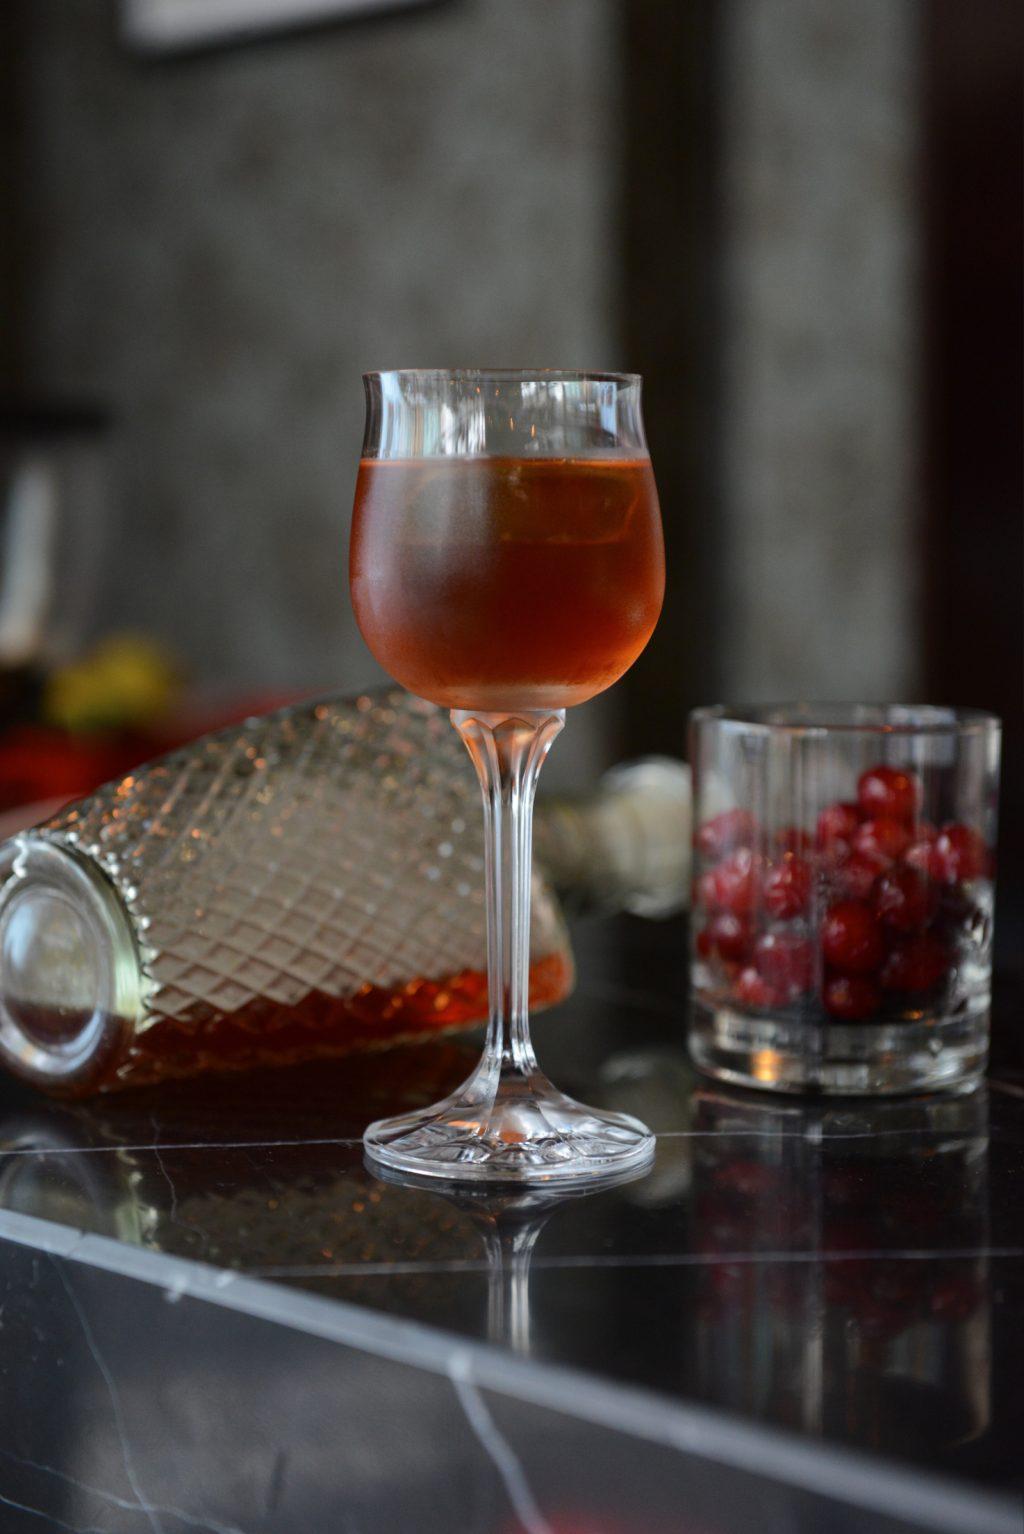 Cranberry Burning Vineyard